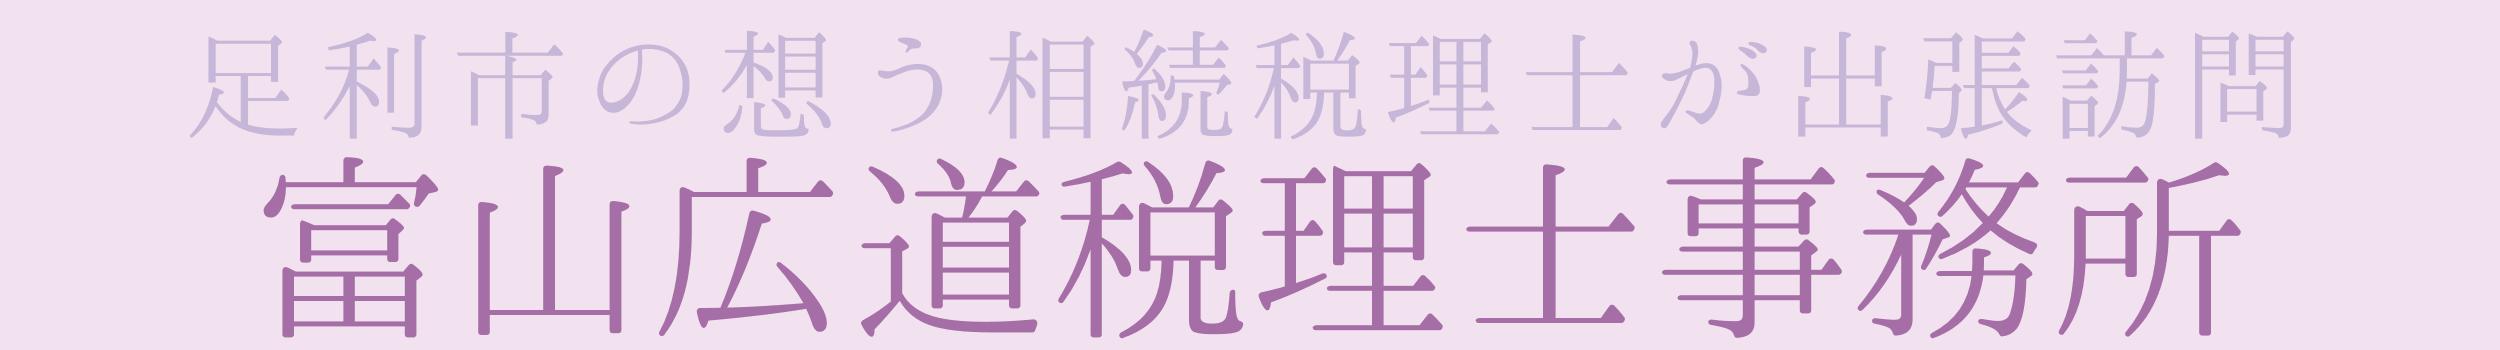 【足利市の想う相続税理士が出張訪問】富山広道税理士事務所